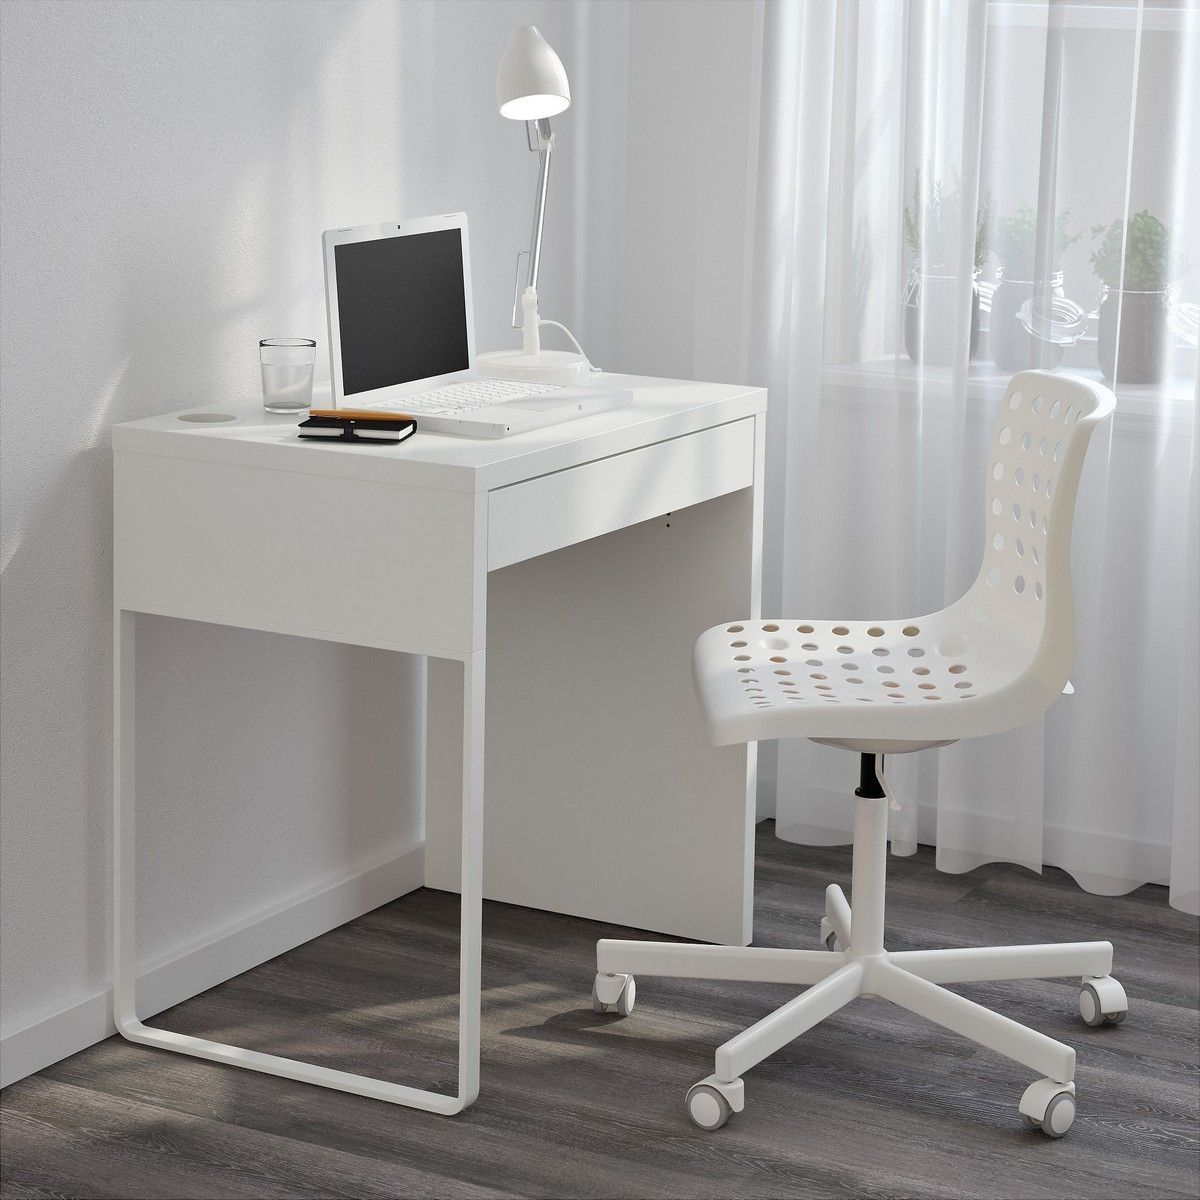 Small White Desk Computer Desk Ideas Pinterest Desk Diy